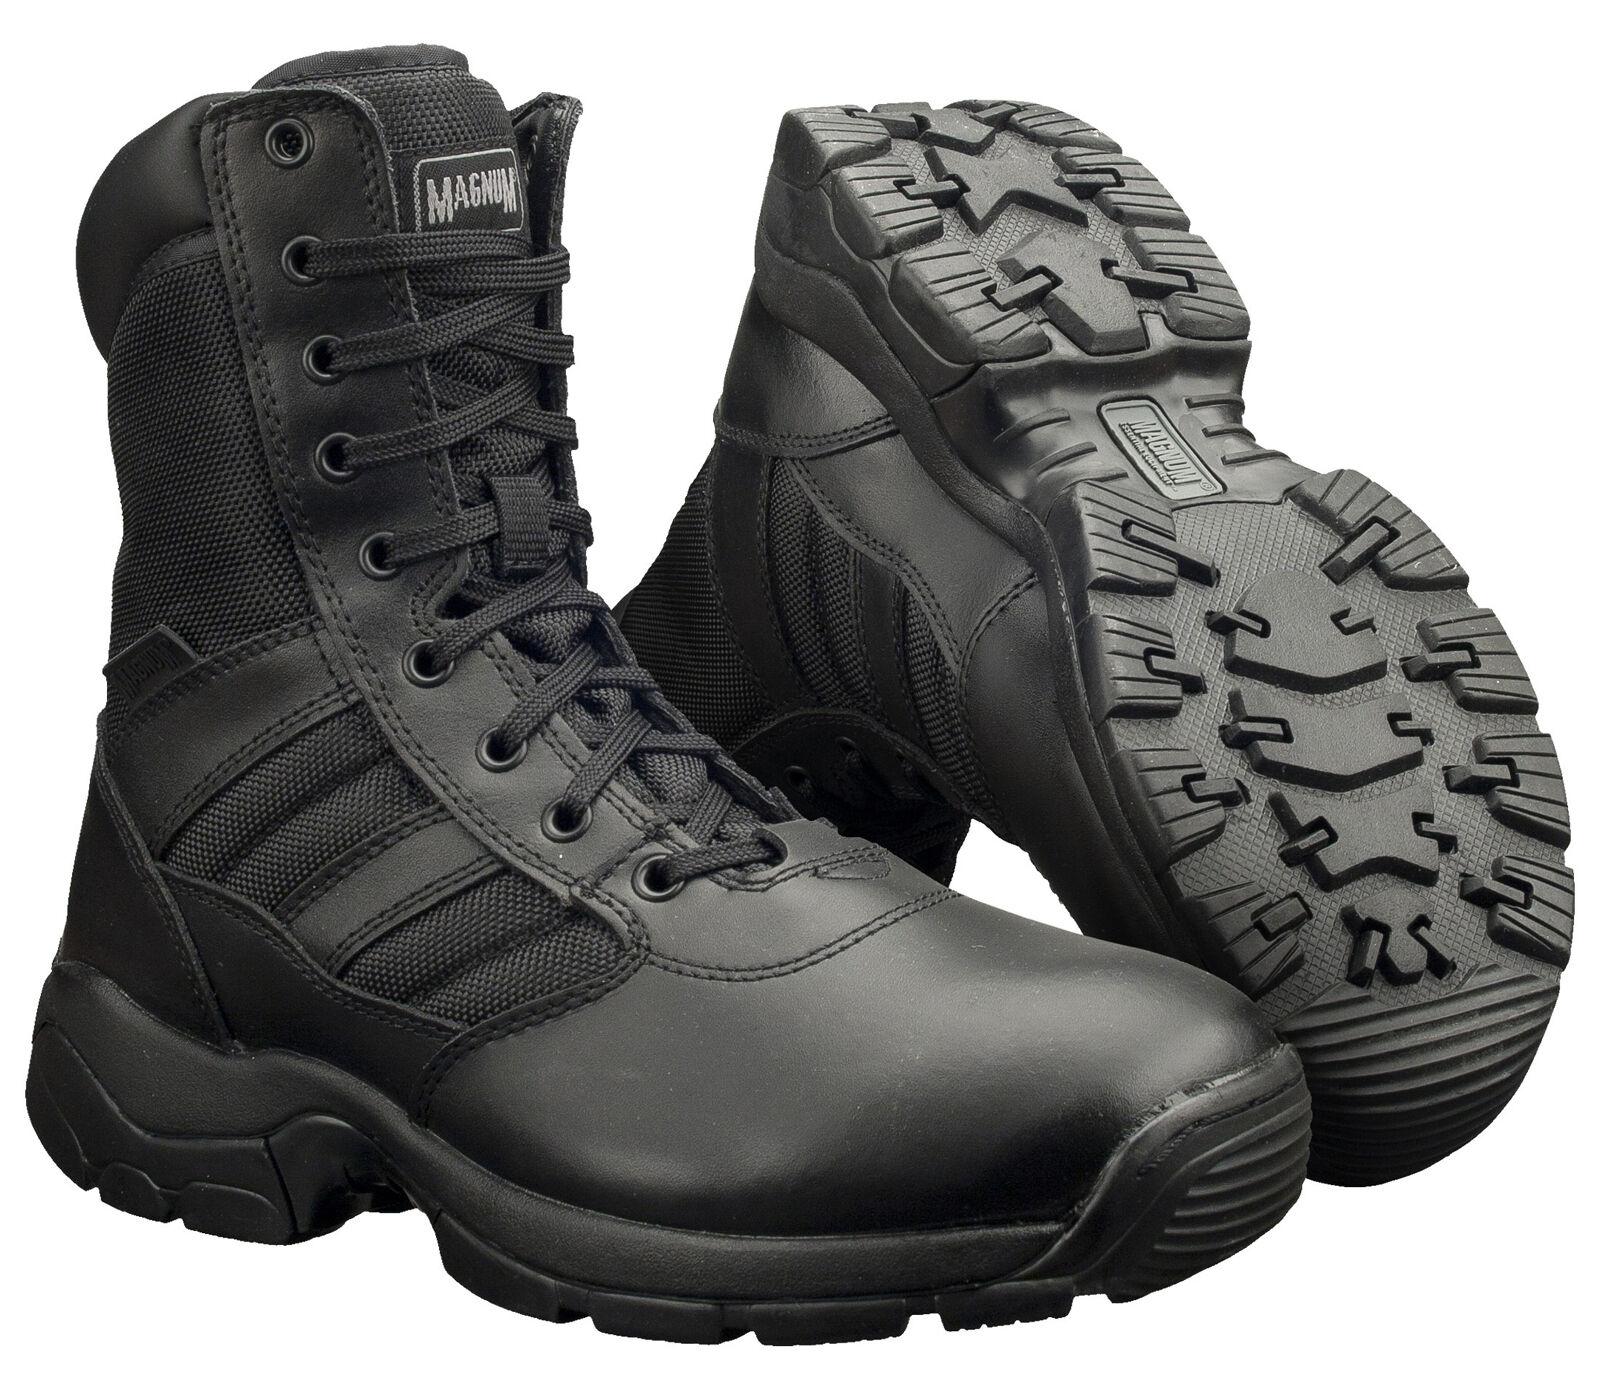 Magnum Pantera 8.0 fuerza de combate ejército policía táctica Negro Militar botas UK4-15